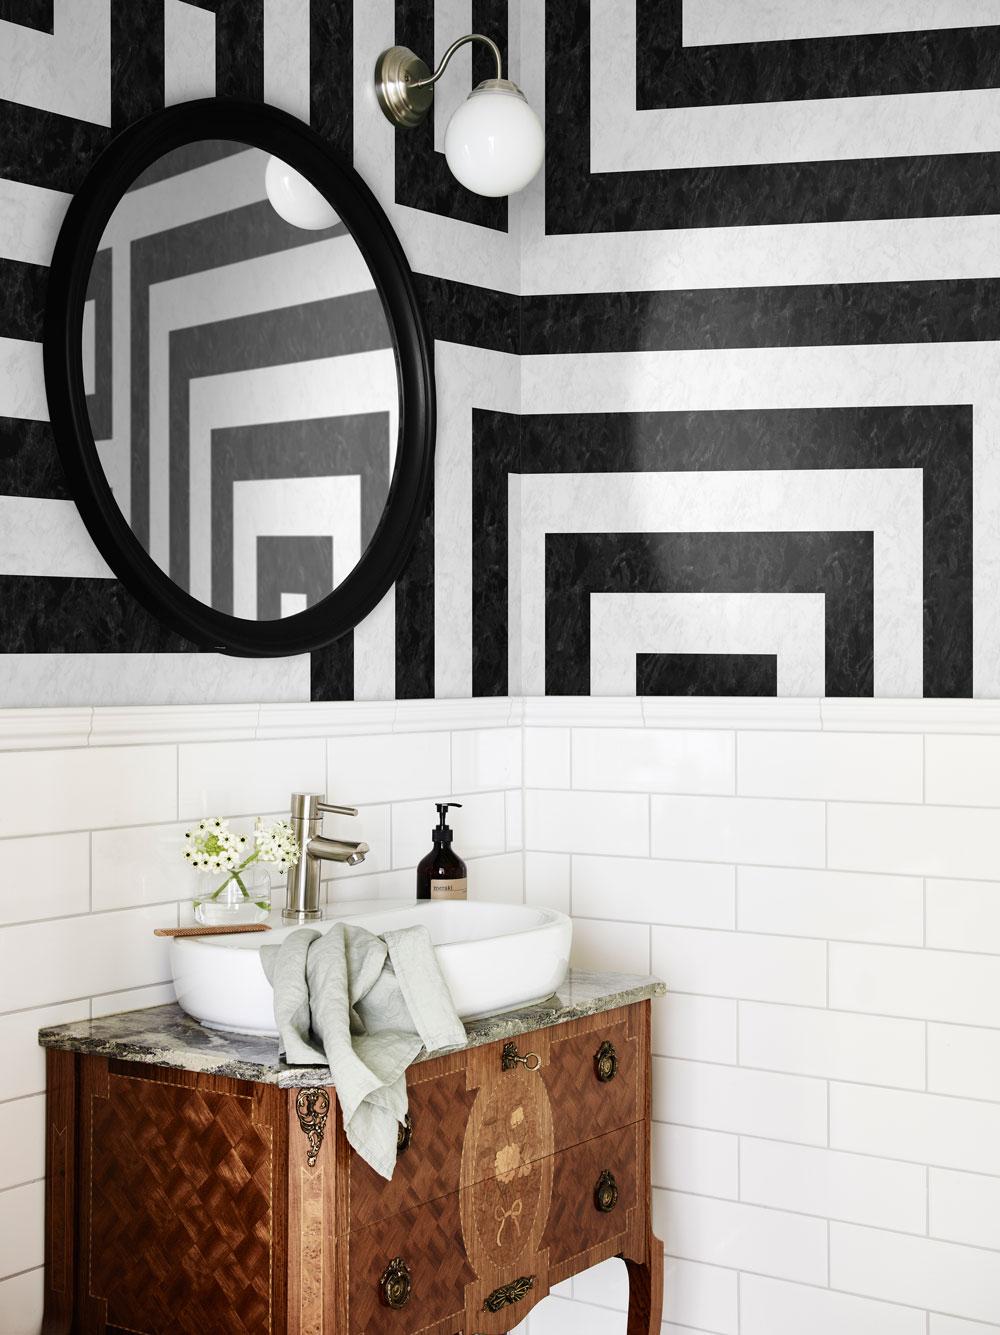 Østerbro Mural - Black / White - by Sandberg